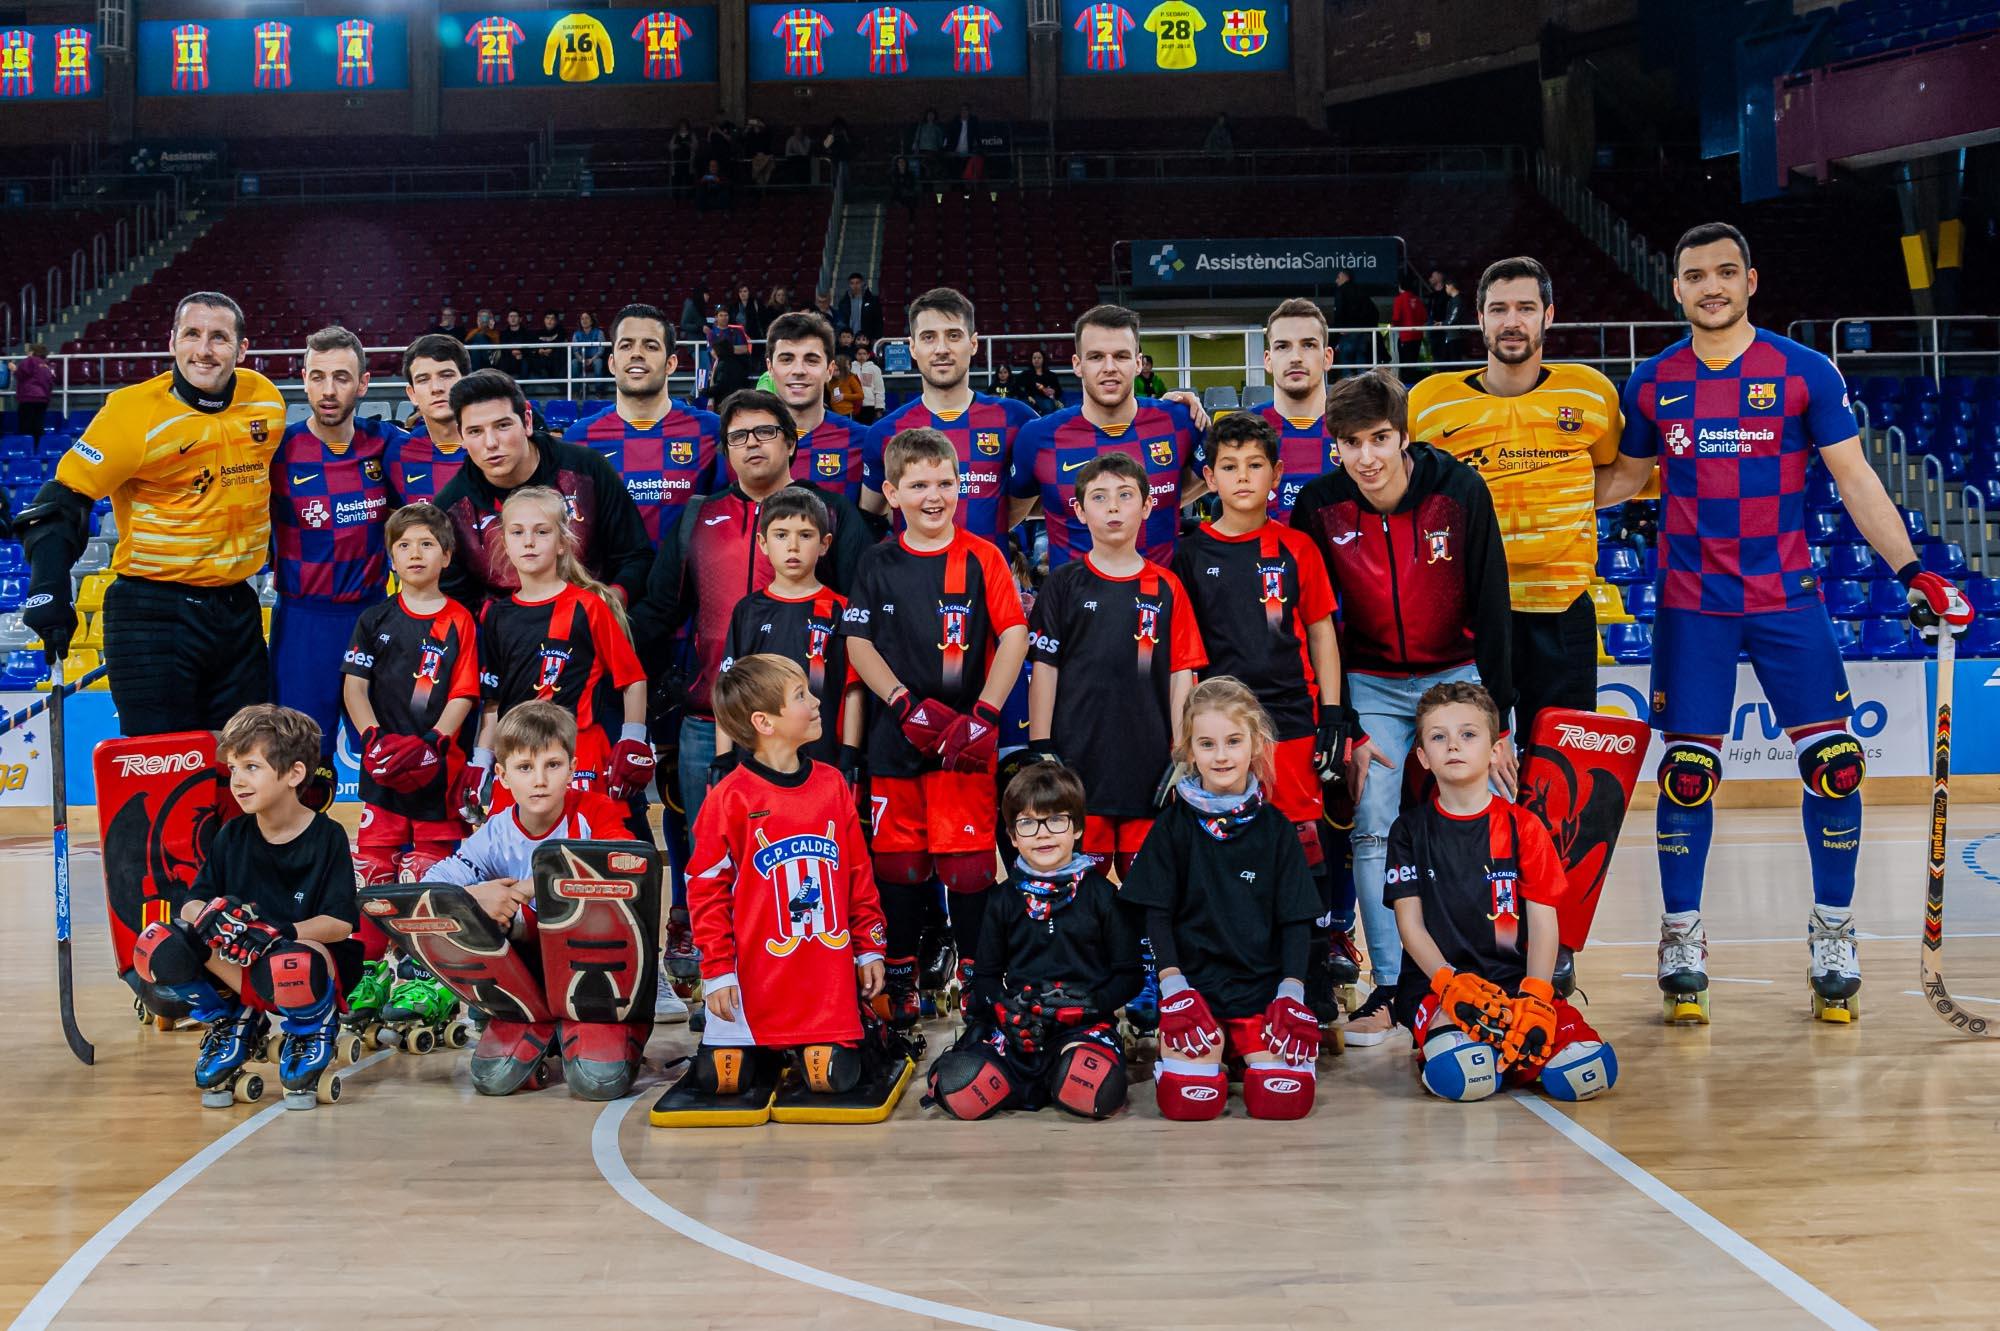 El CP Caldes visita el Palau Blaugrana